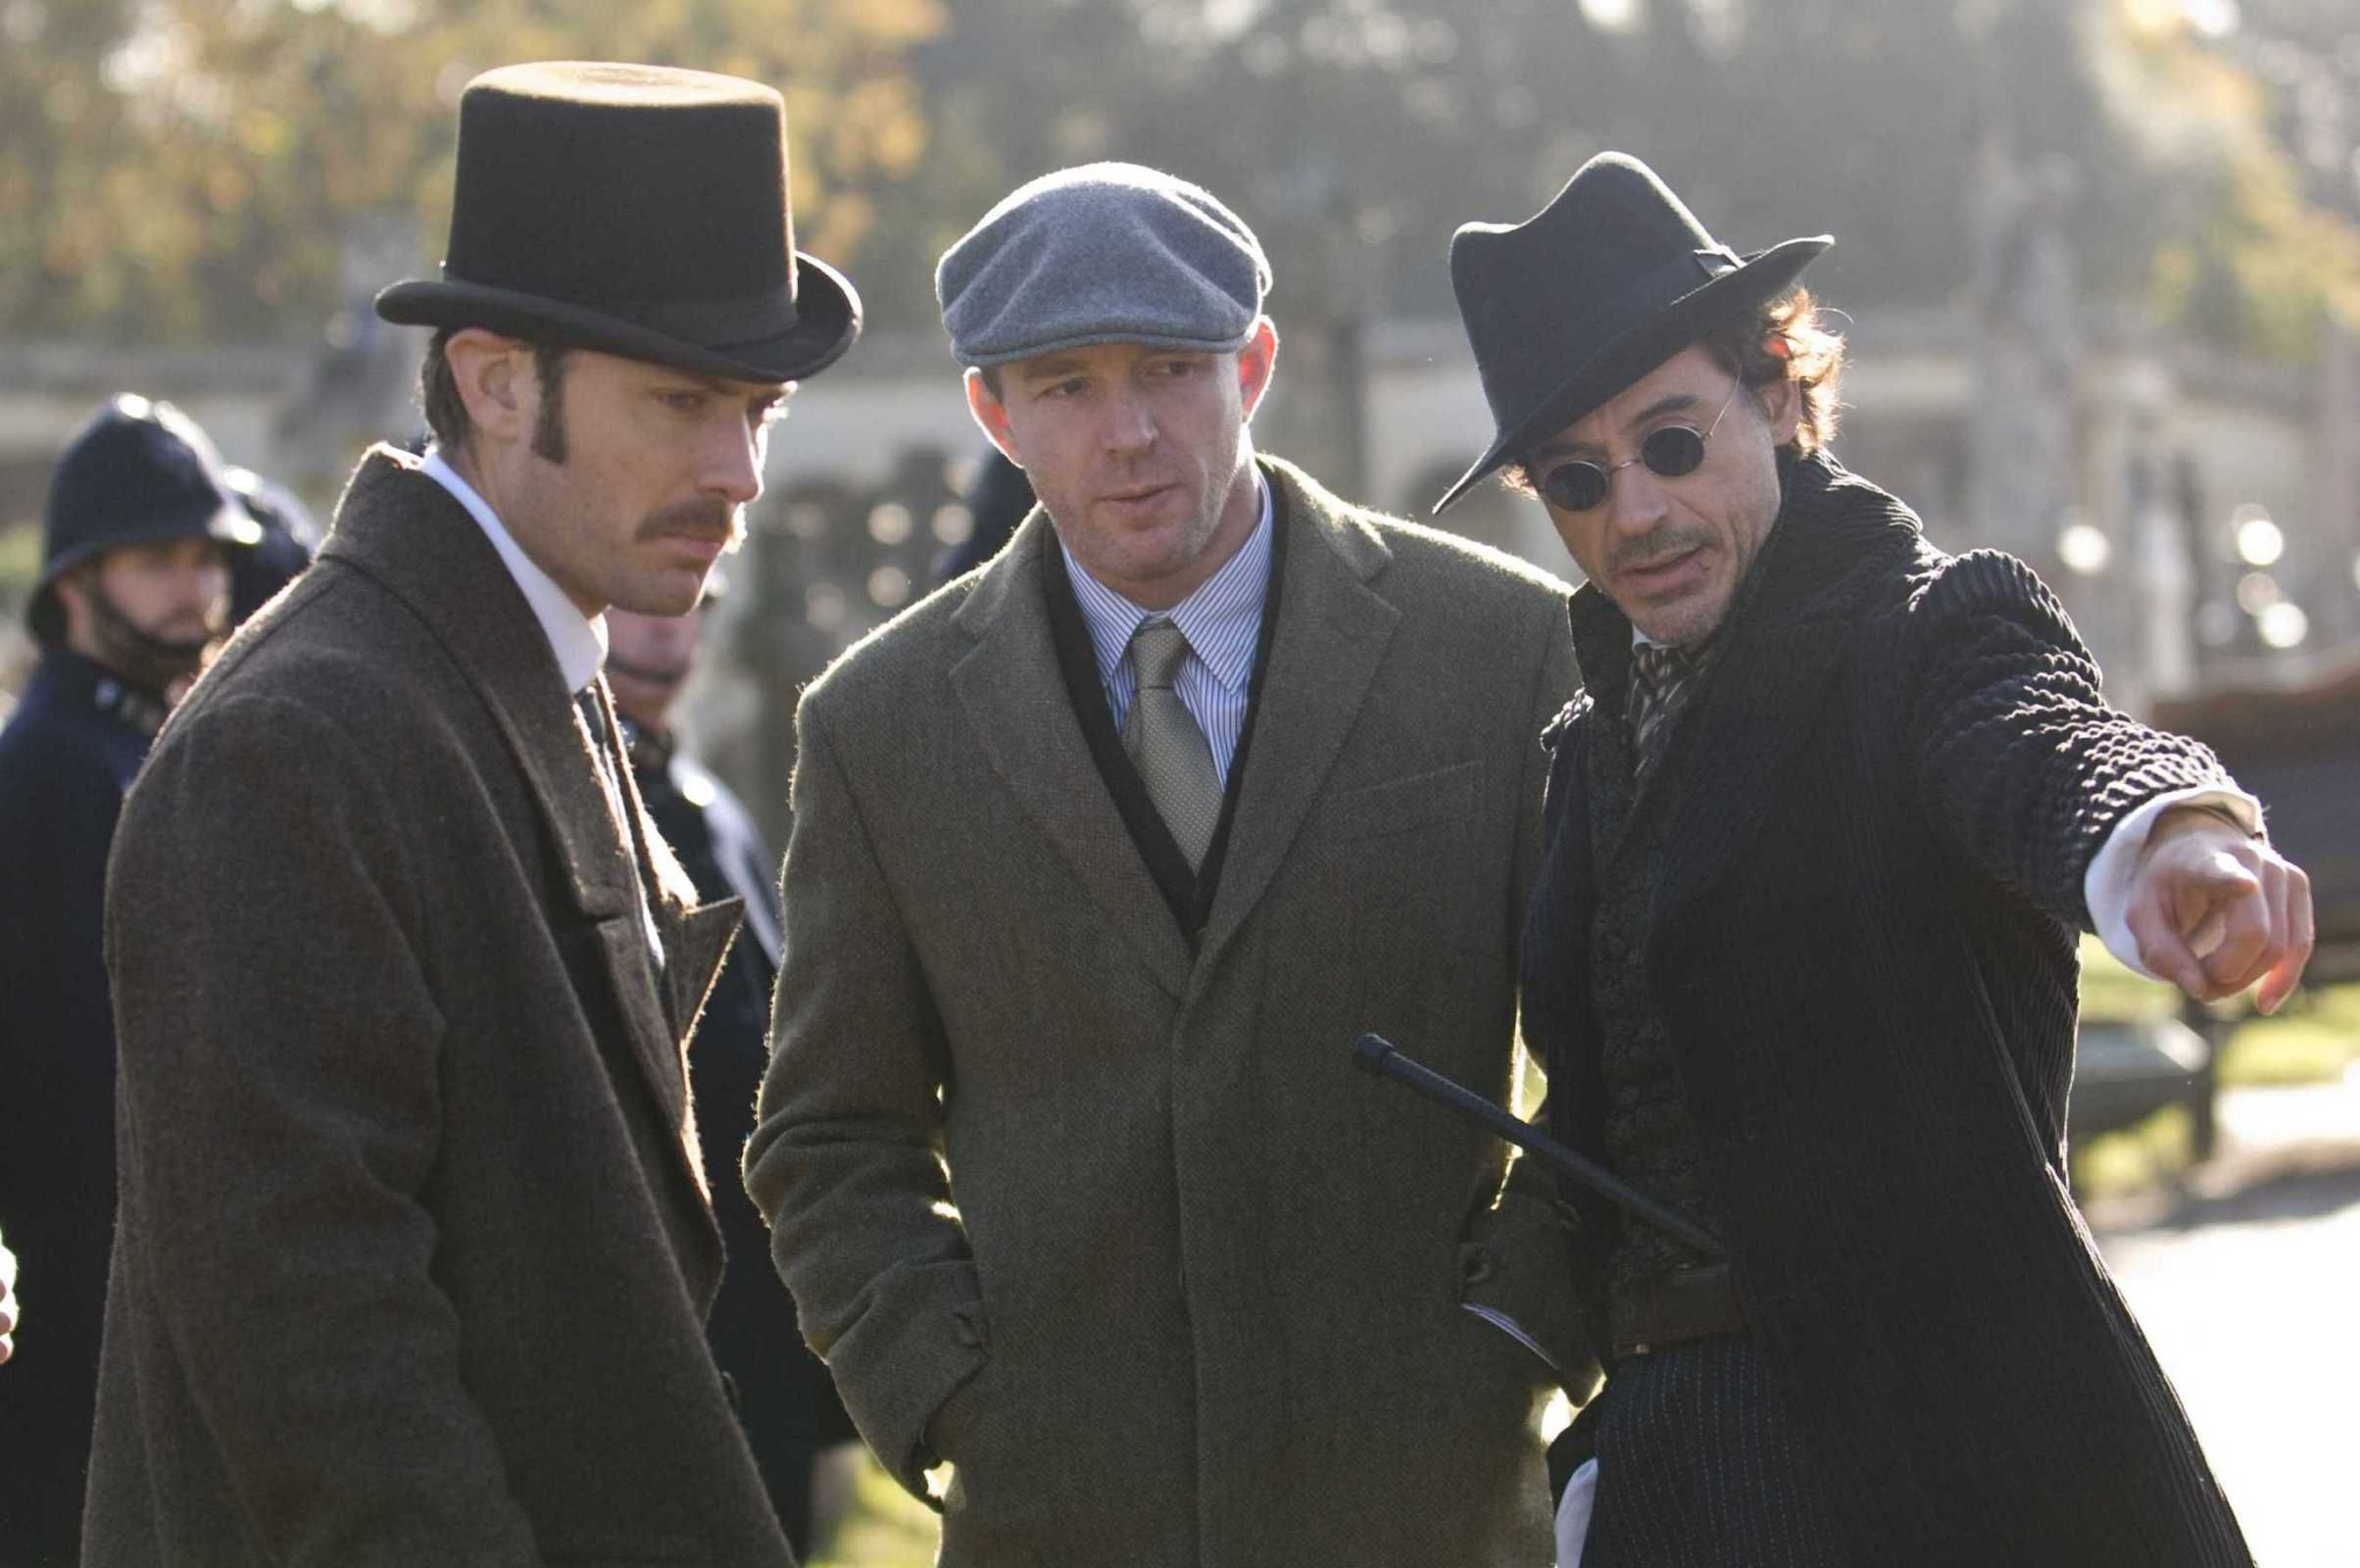 Sherlock Homes 3: Screenwriter James Coyne Is on the Case